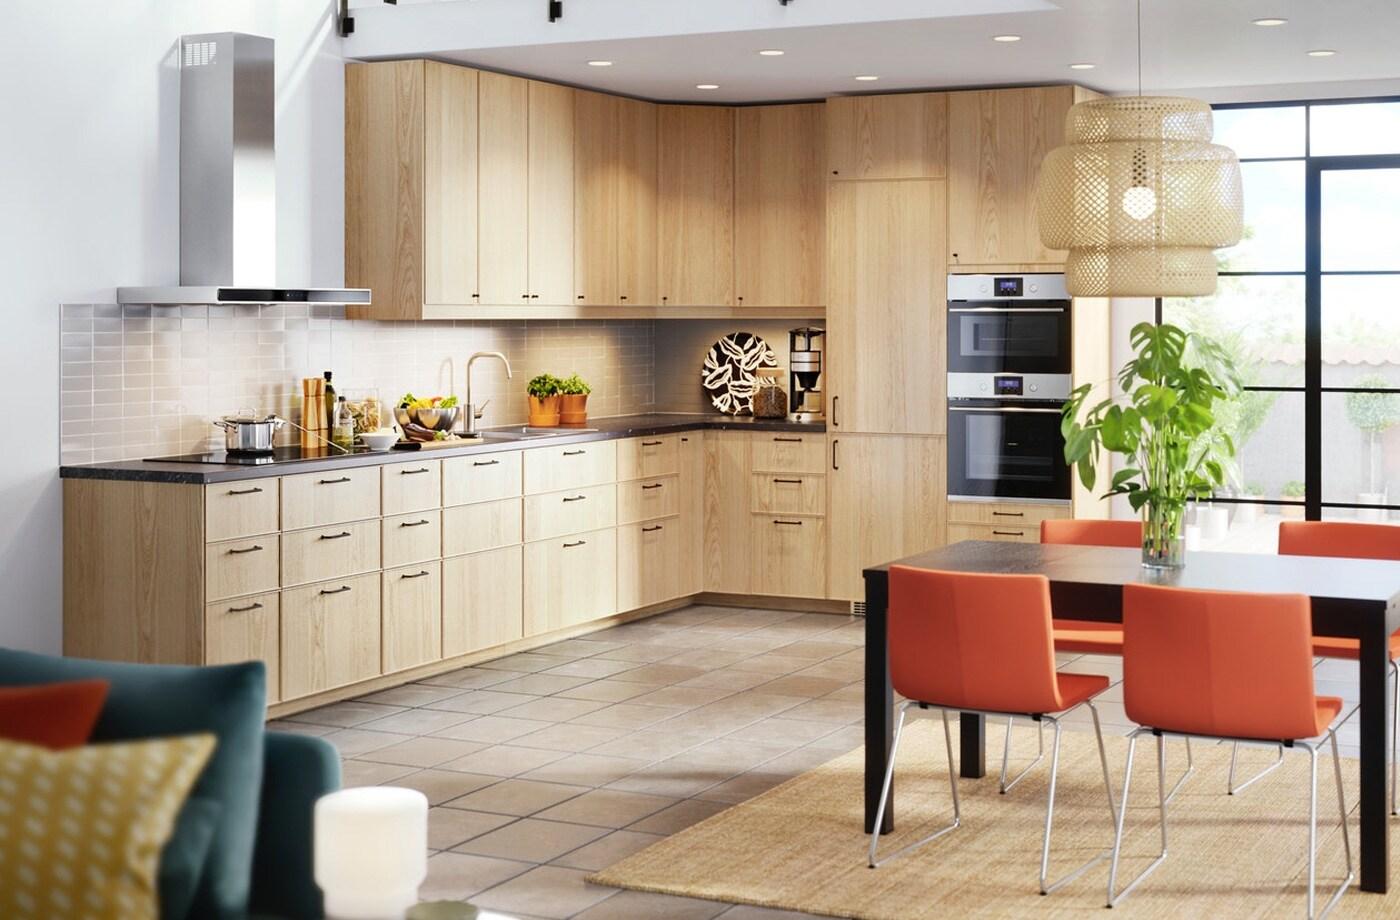 Picture of: Ekestad Serien Ikea